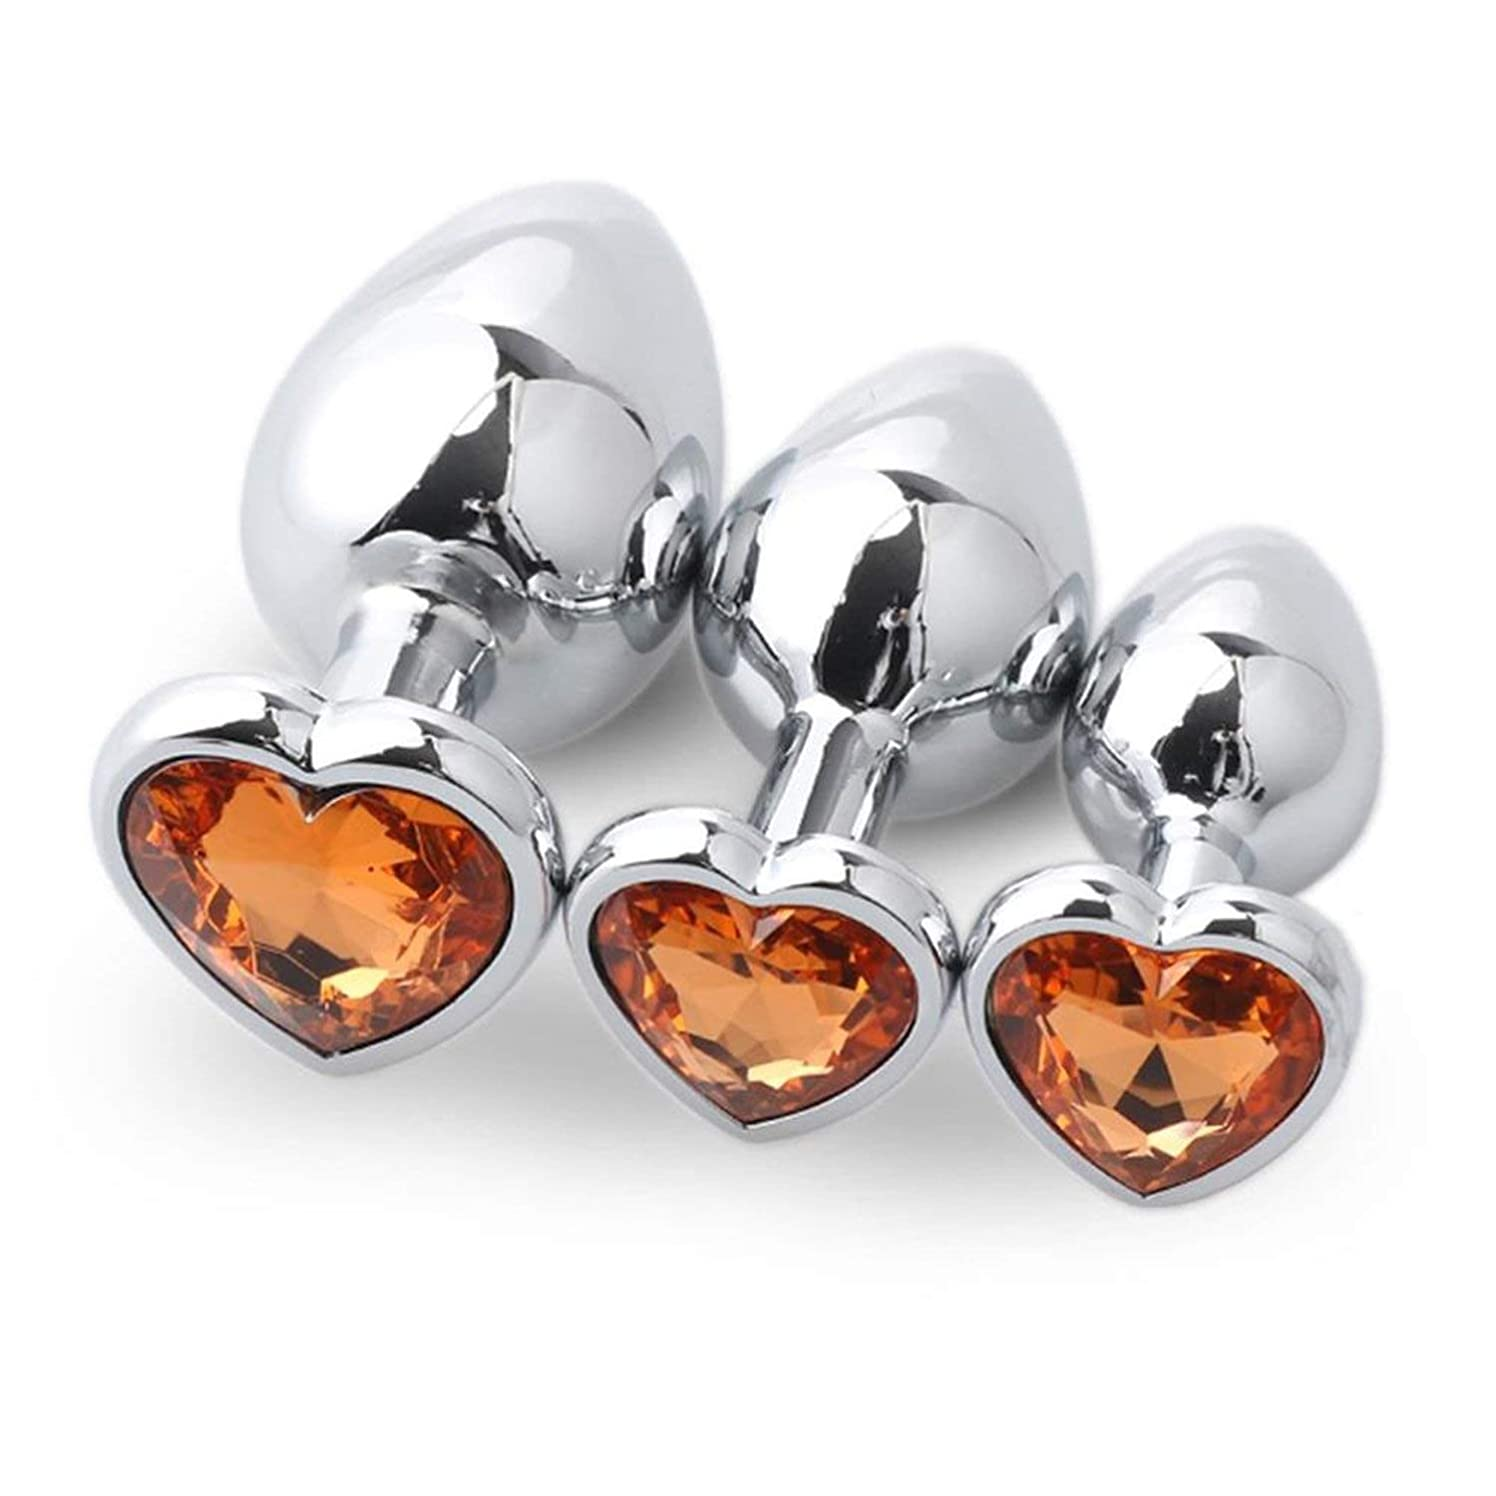 Thdvb tShirt Ví-bratórs Women Rabbit 3pcs/Set Metal Anál Beads with Crystal Jewelry Heart Būtt Plug Pr?státê Massager Sexs-Toys for Men Women Anál Plug,Gold,Joystick Ví-bratór